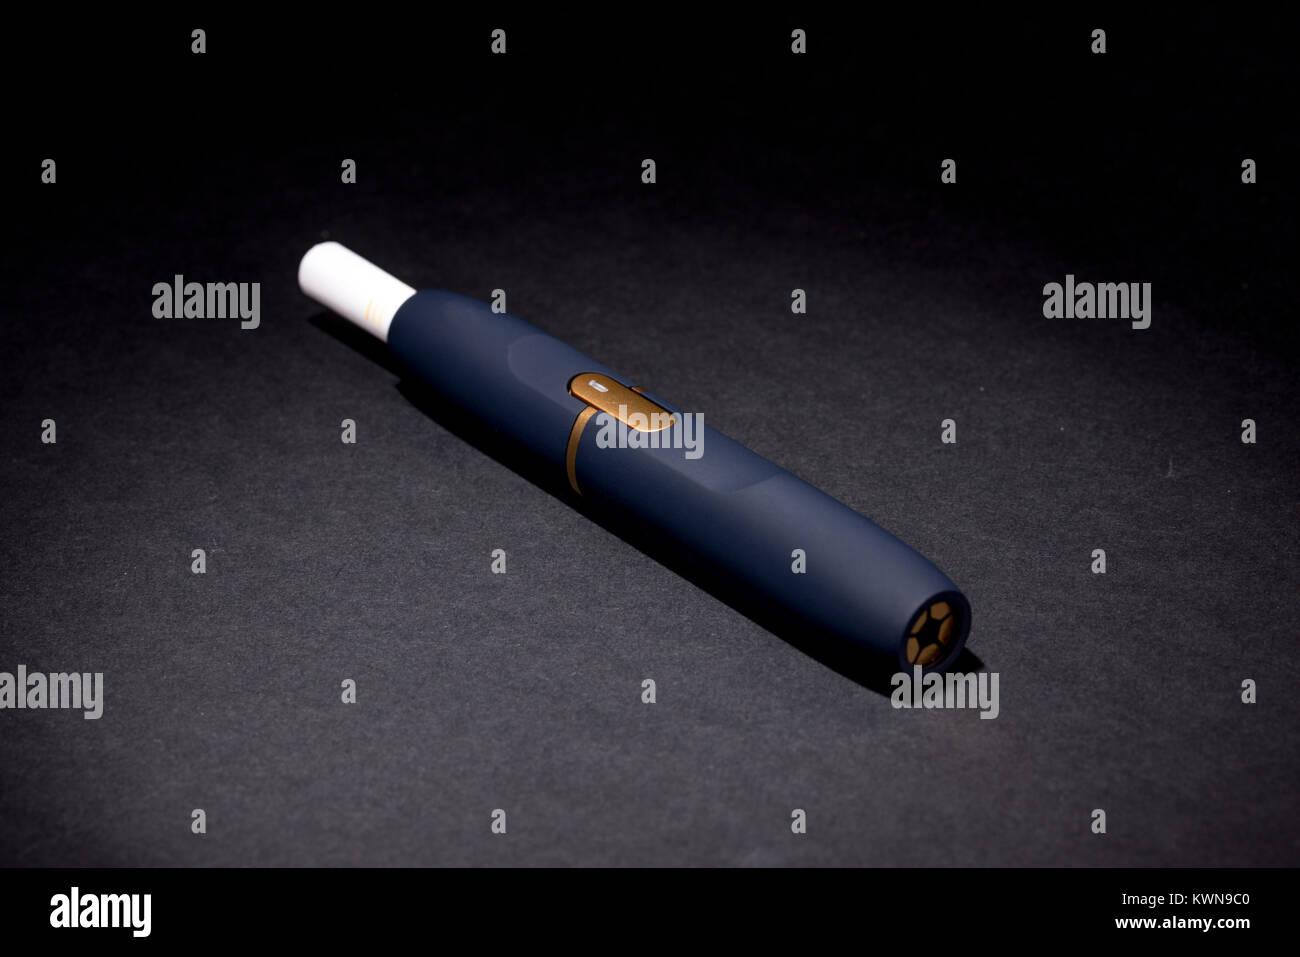 Newest electronic cigarettes, heating tobacco system IQOS, smoking, dark blue isolated on black background - Stock Image